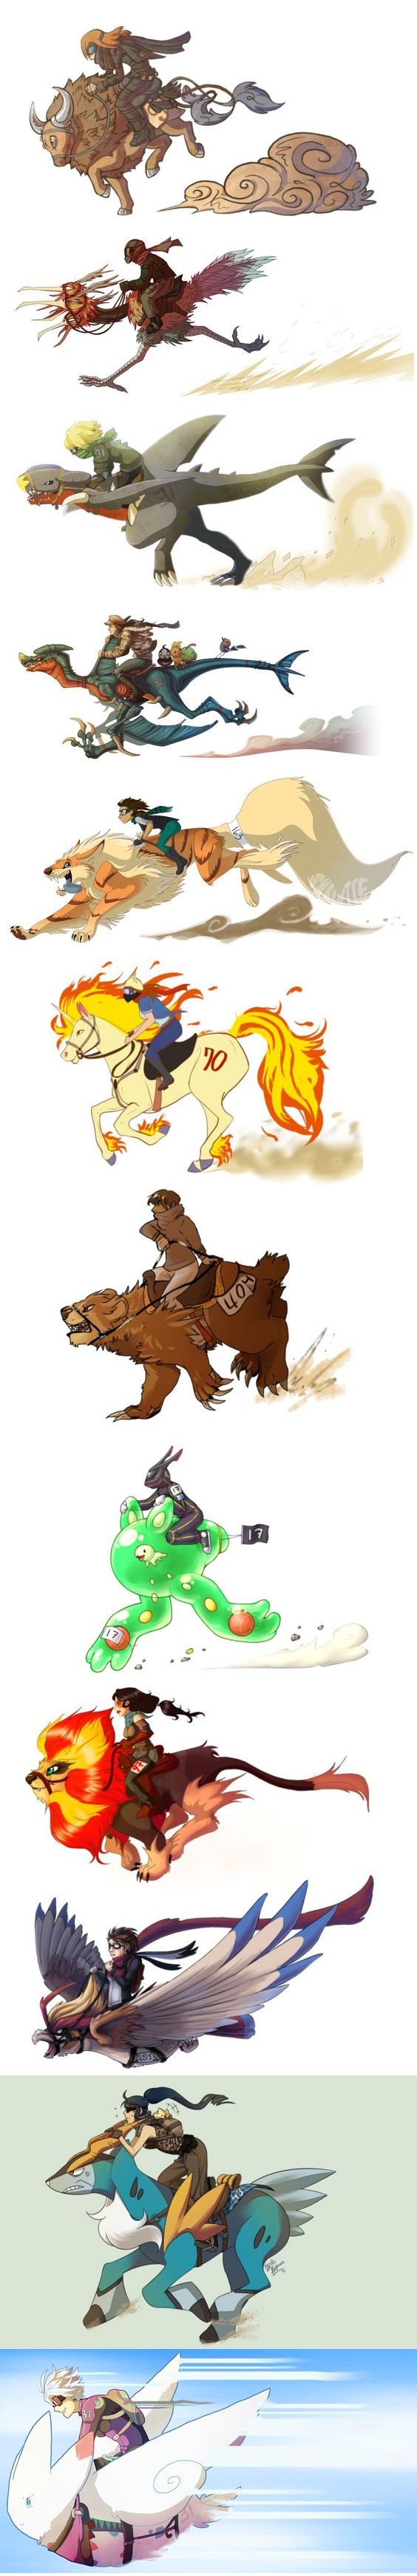 The Great Pokemon Race! Tauros, Dodrio, Garchomp, Arcanine, Rapidash, Ursaring, Reuniclus, Pyroar,…